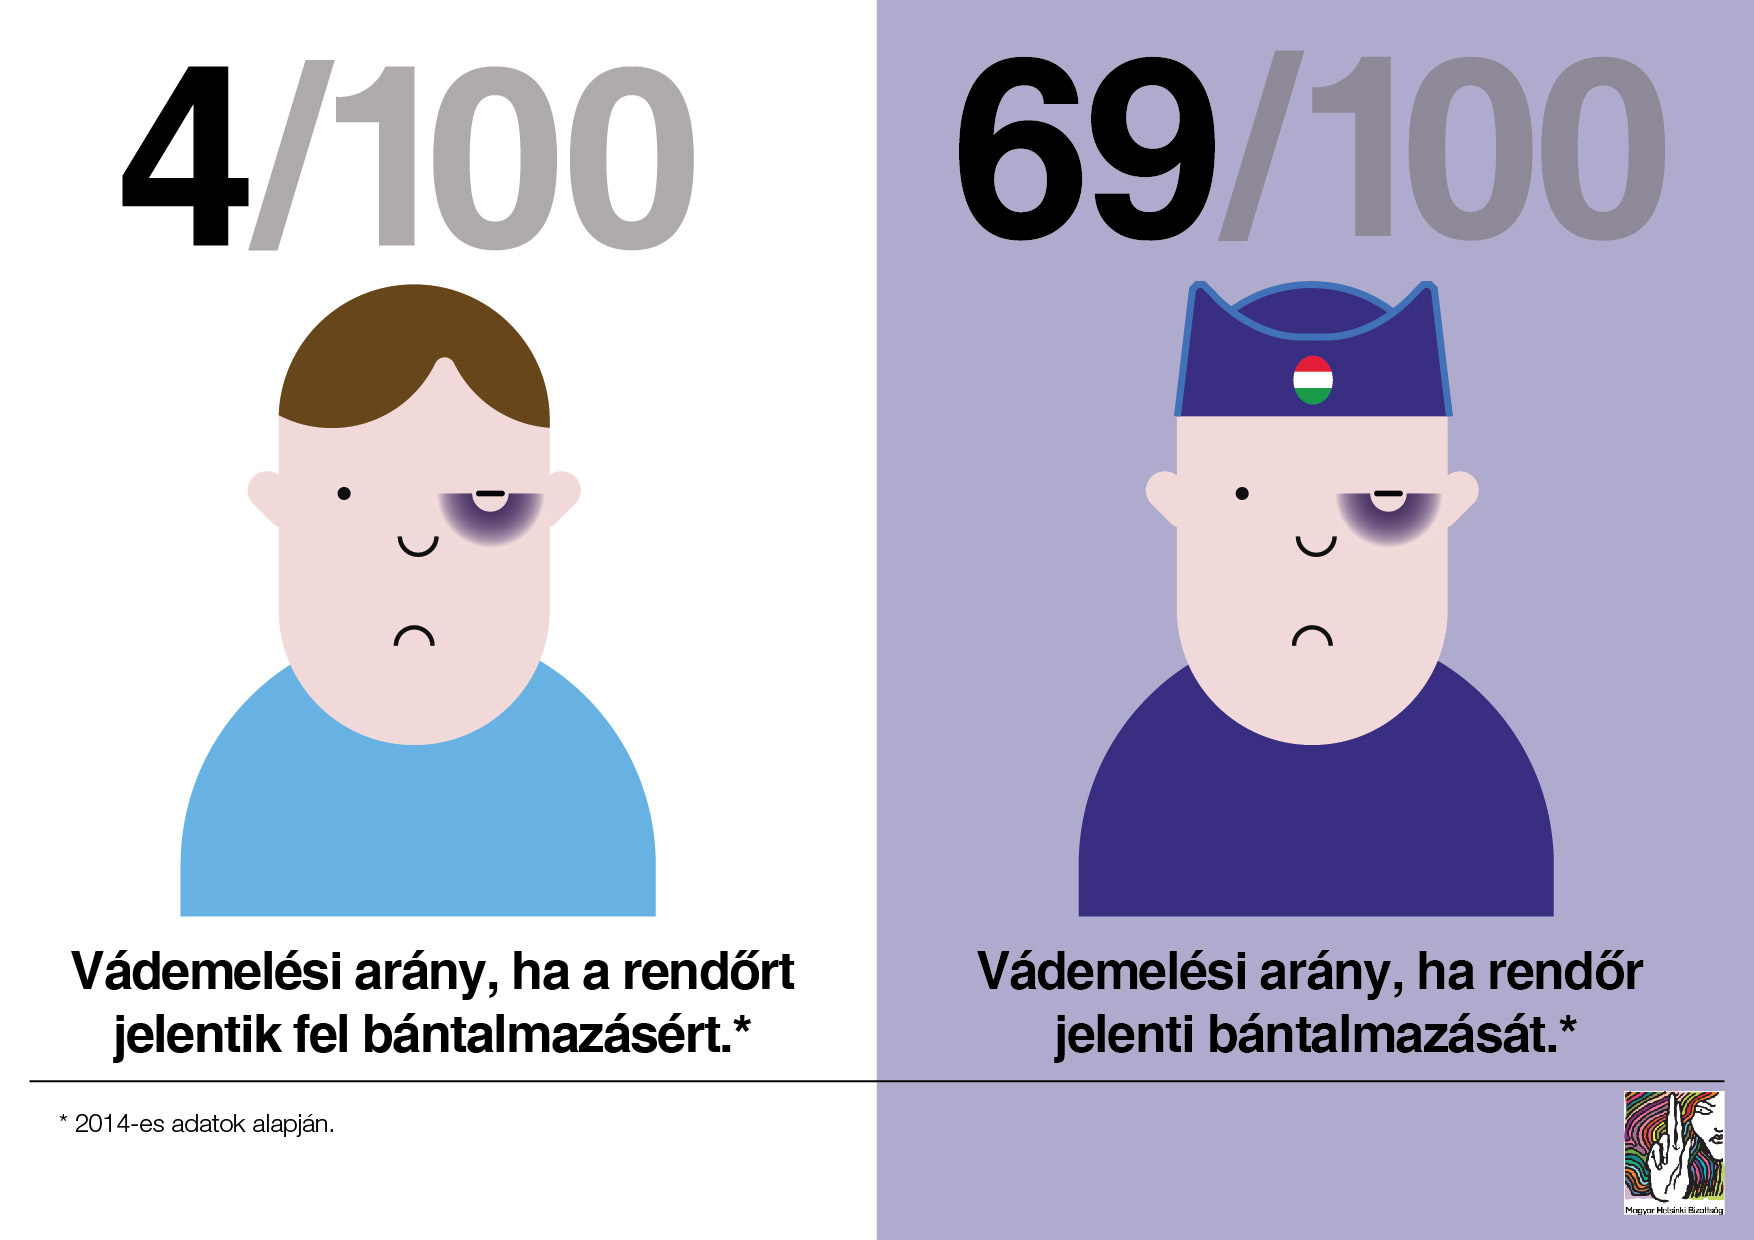 helsinki_bizottsag_info_201_11_12_1_1.jpg